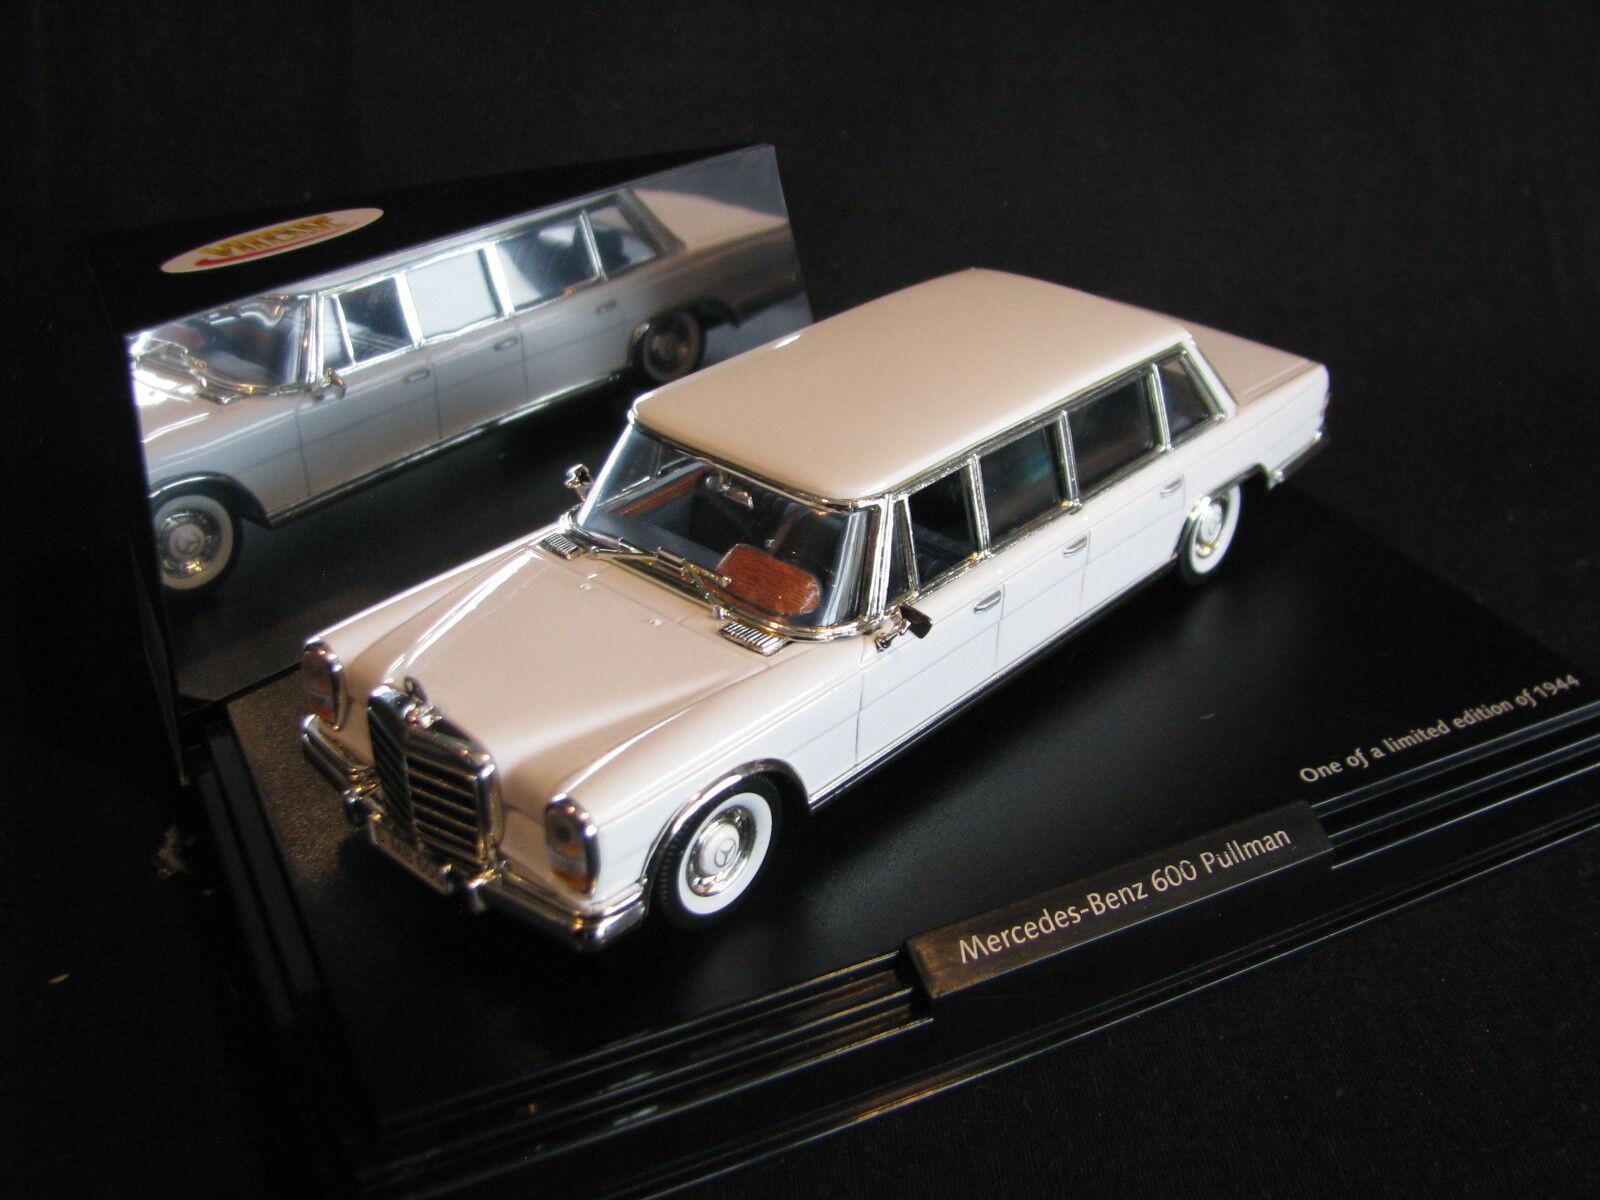 Vitesse Mercedes-Benz 600 Pullman 1 43 White (JS)